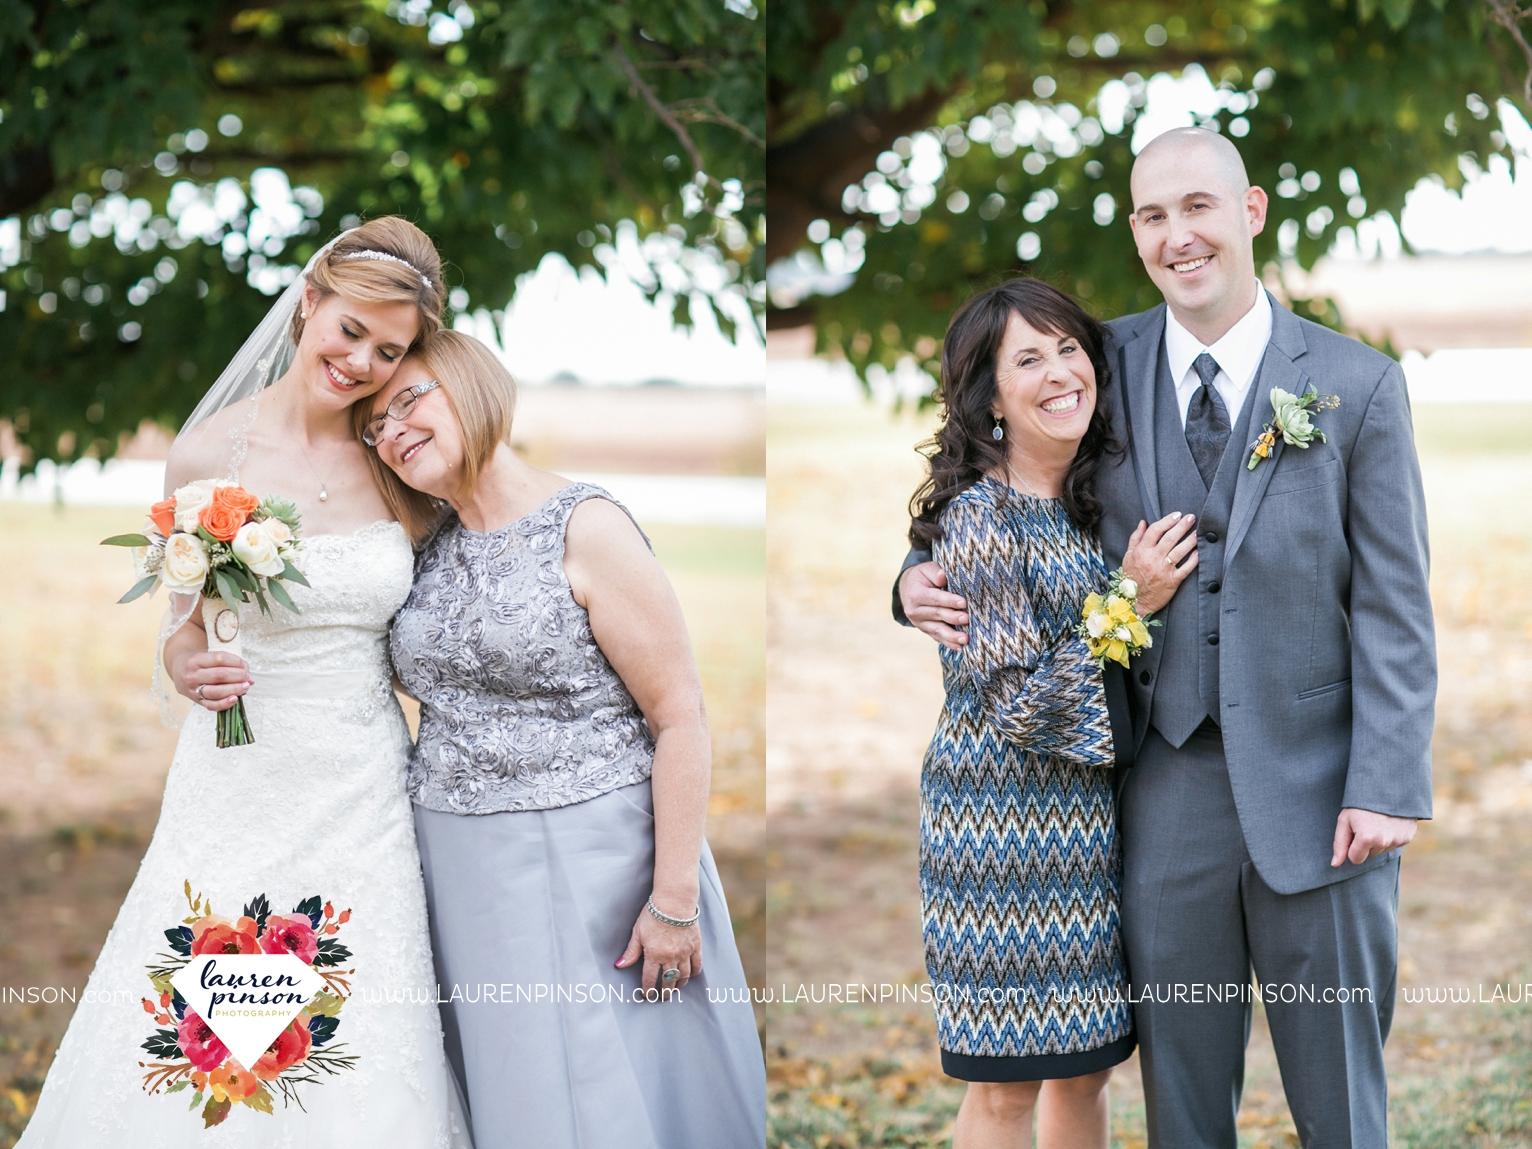 kemp-center-for-the-arts-wichita-falls-texas-wedding-photographer-fall-wedding-pumpkins-150.jpg